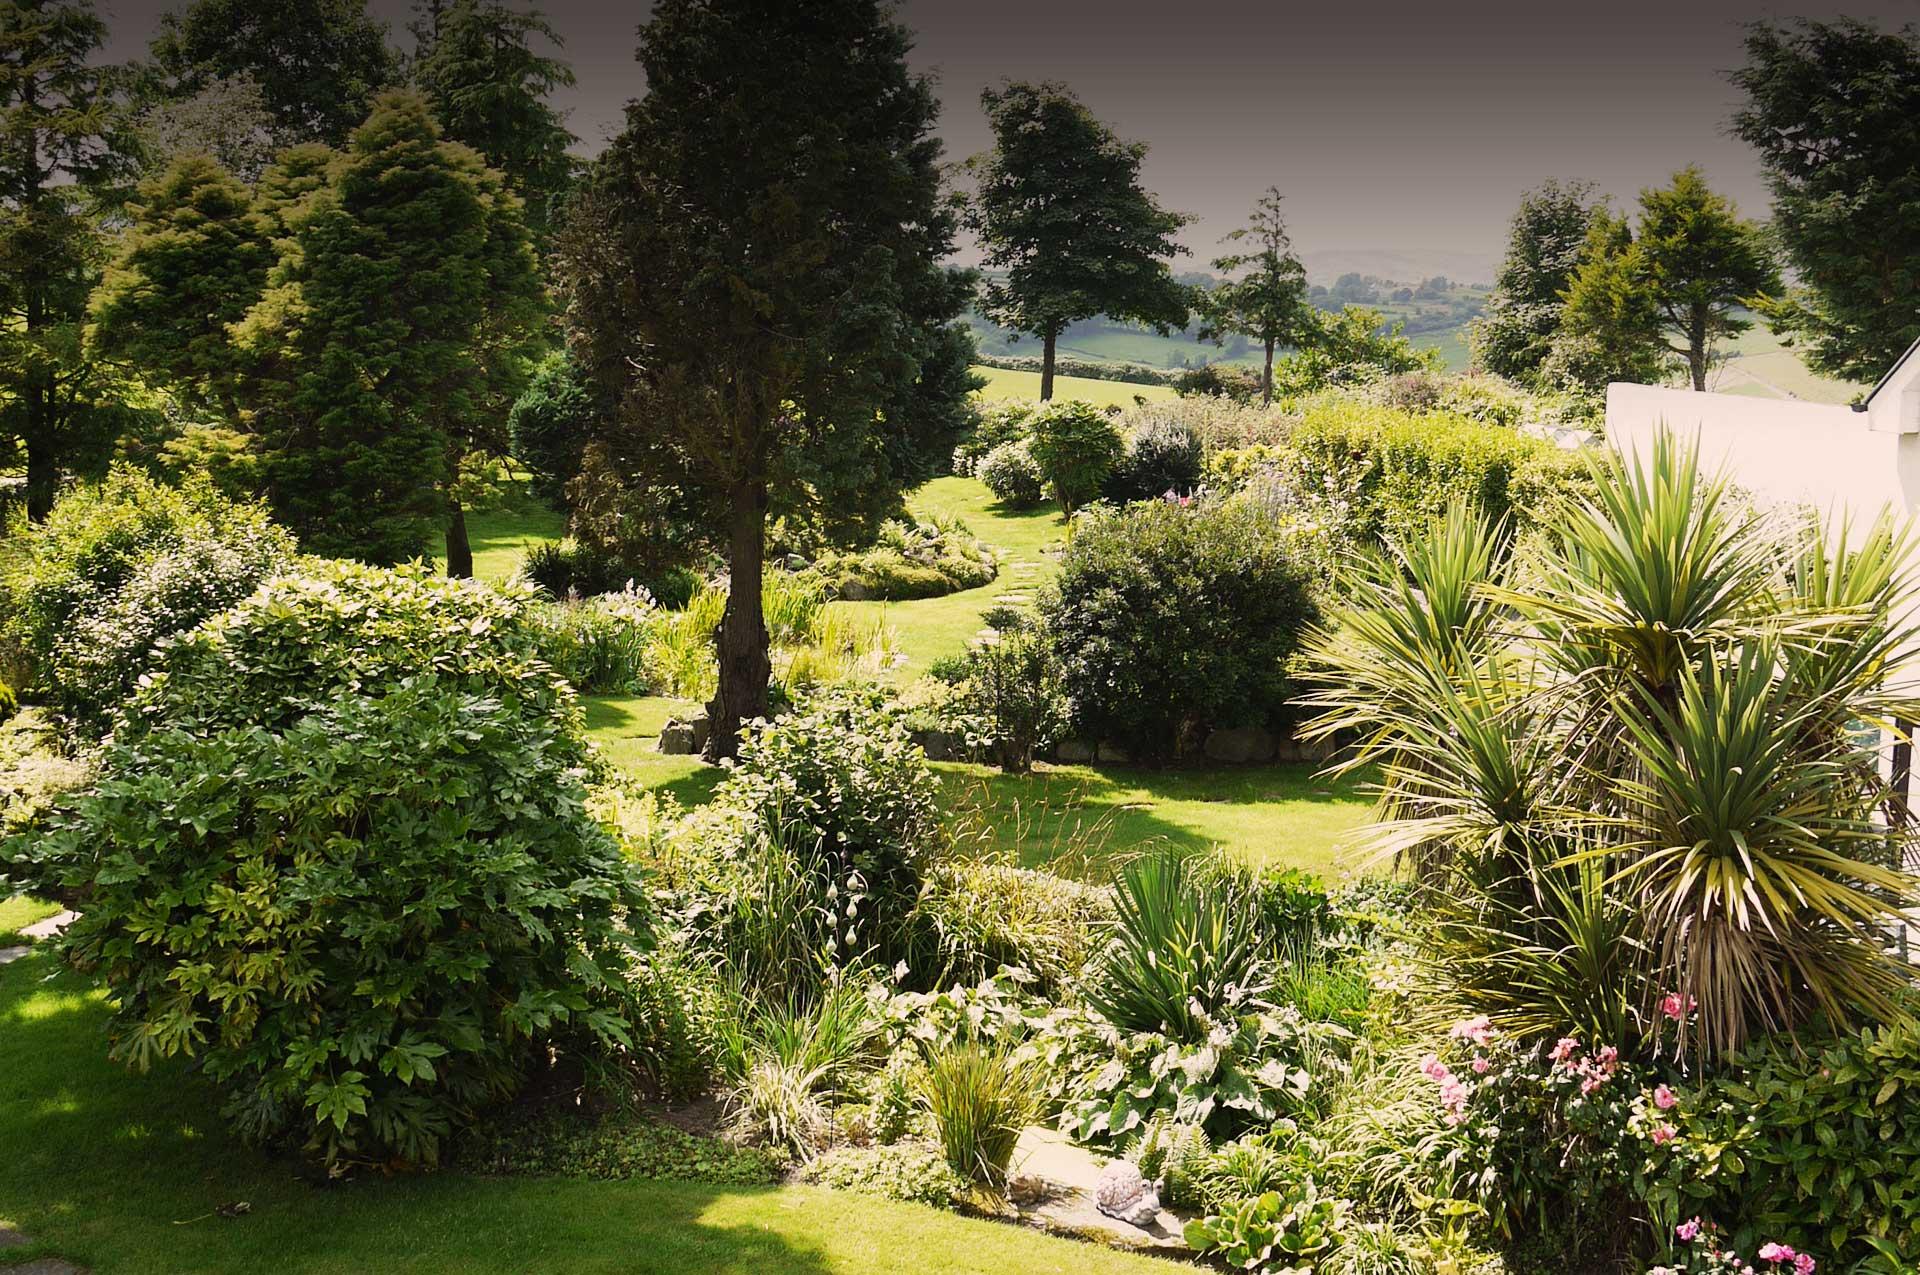 Incroyable Pine Tree Lodge Garden